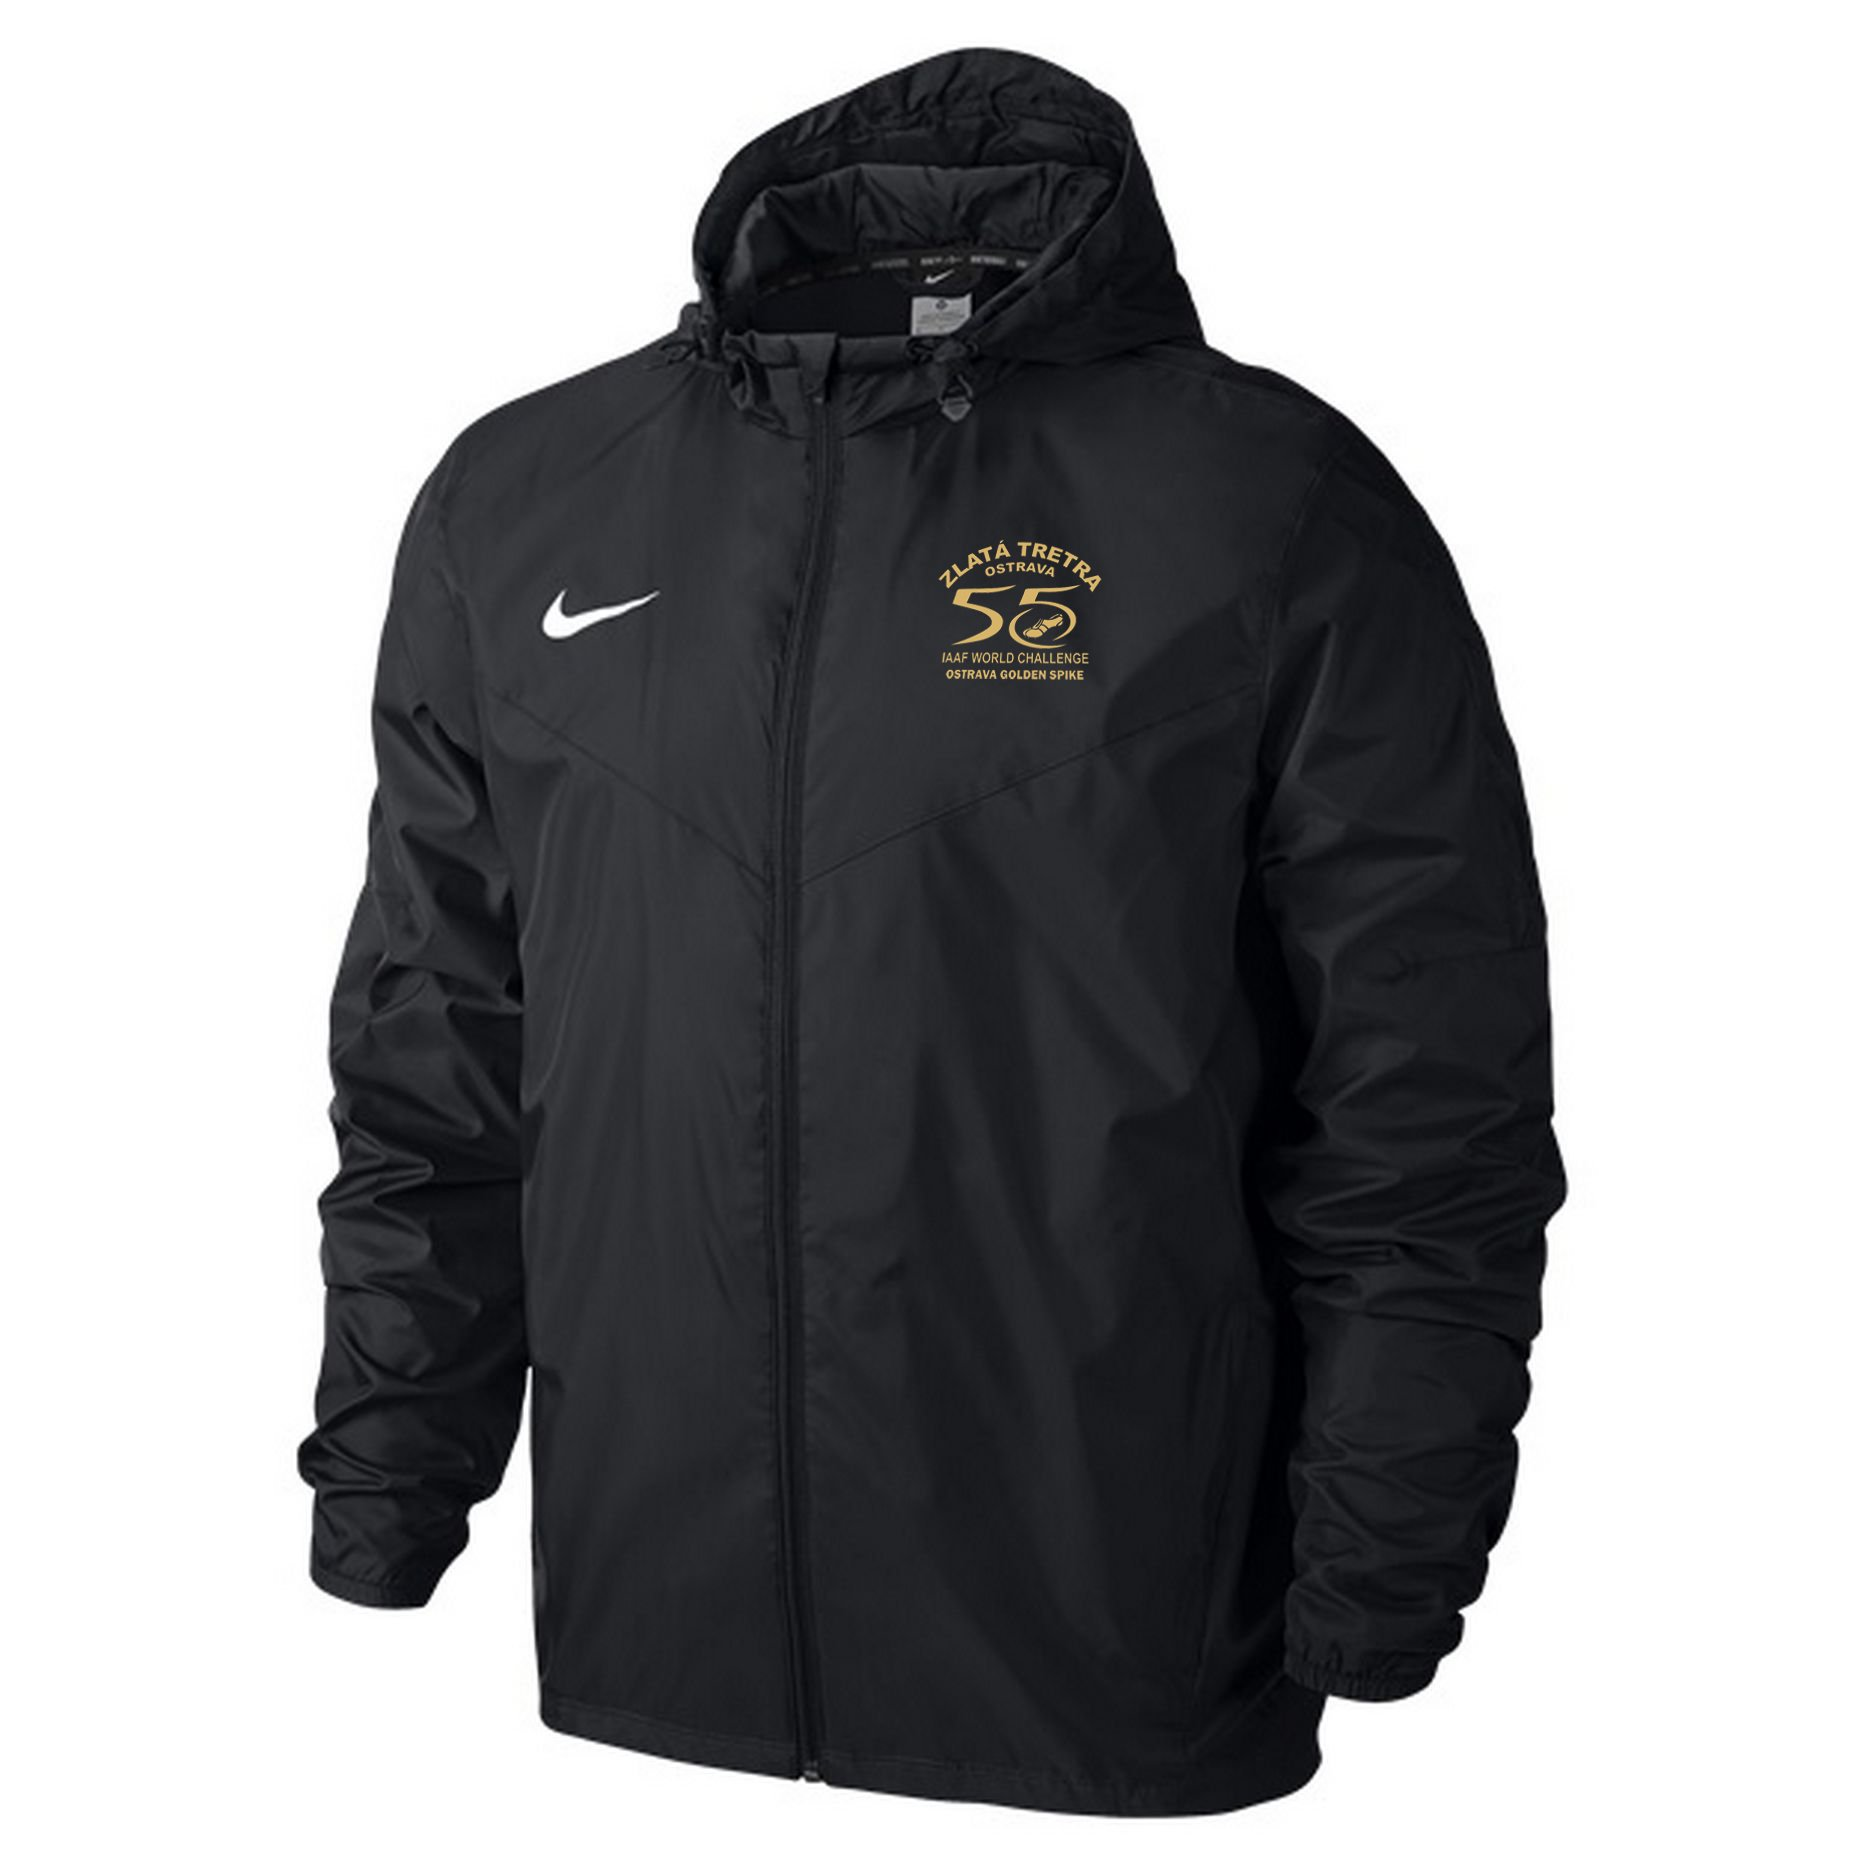 Bunda s kapucí Nike Youth Team Sideline Rain Jacket Zlata tretra